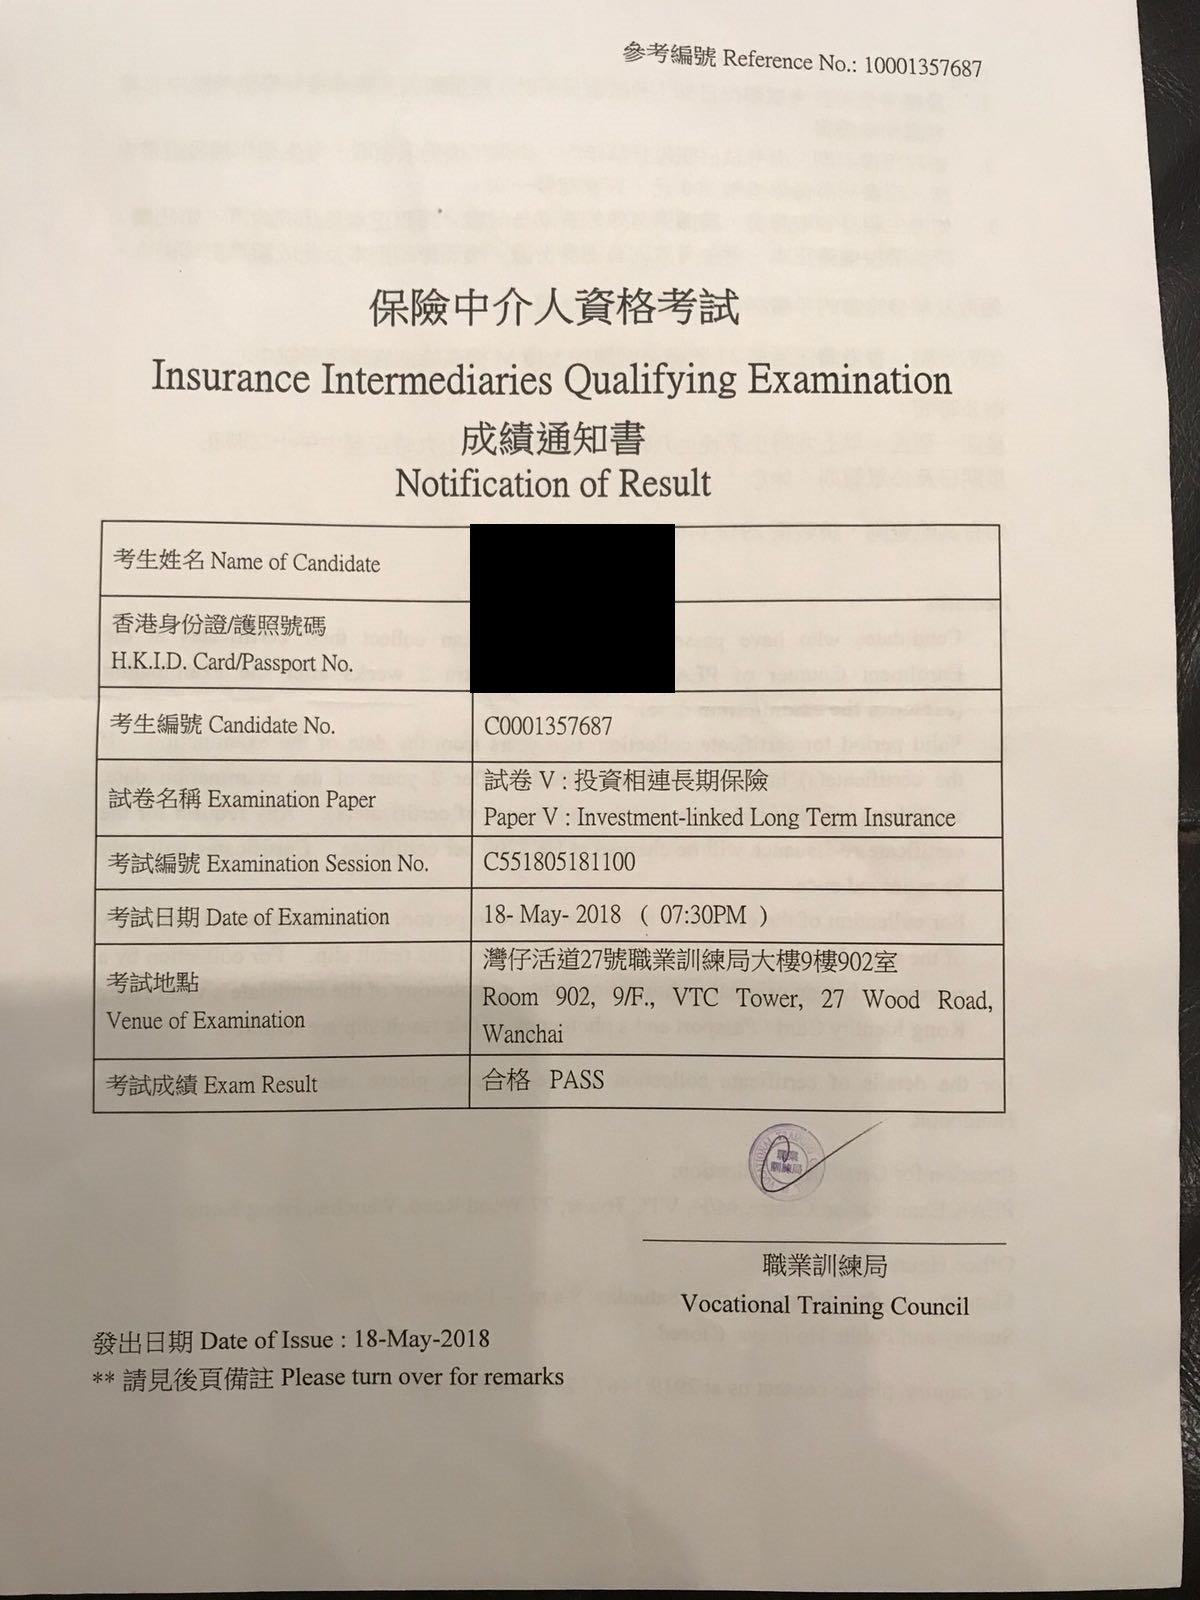 LNH 18/5/2018 IIQE Paper 5 保險中介人資格考試卷五 Pass